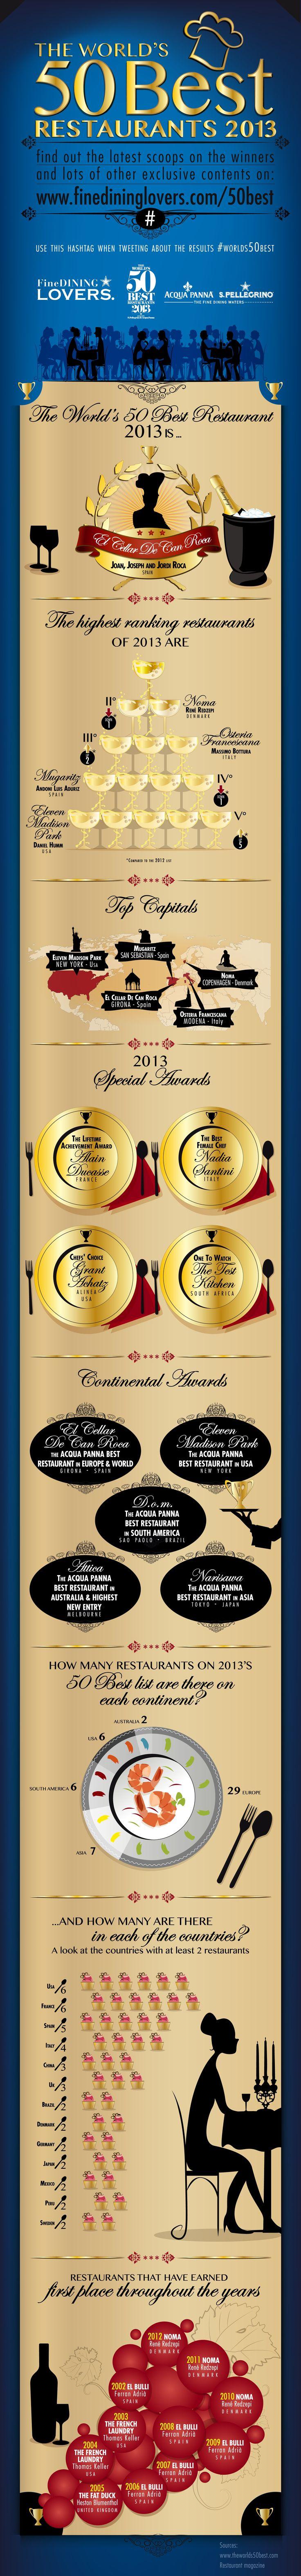 The Worlds #50BestRestaurants Awards 2013 - #Infographic - http://finedininglovers.com/blog/50-best-restaurants-news/the-worlds-50-best-restaurants-2013-infographic/